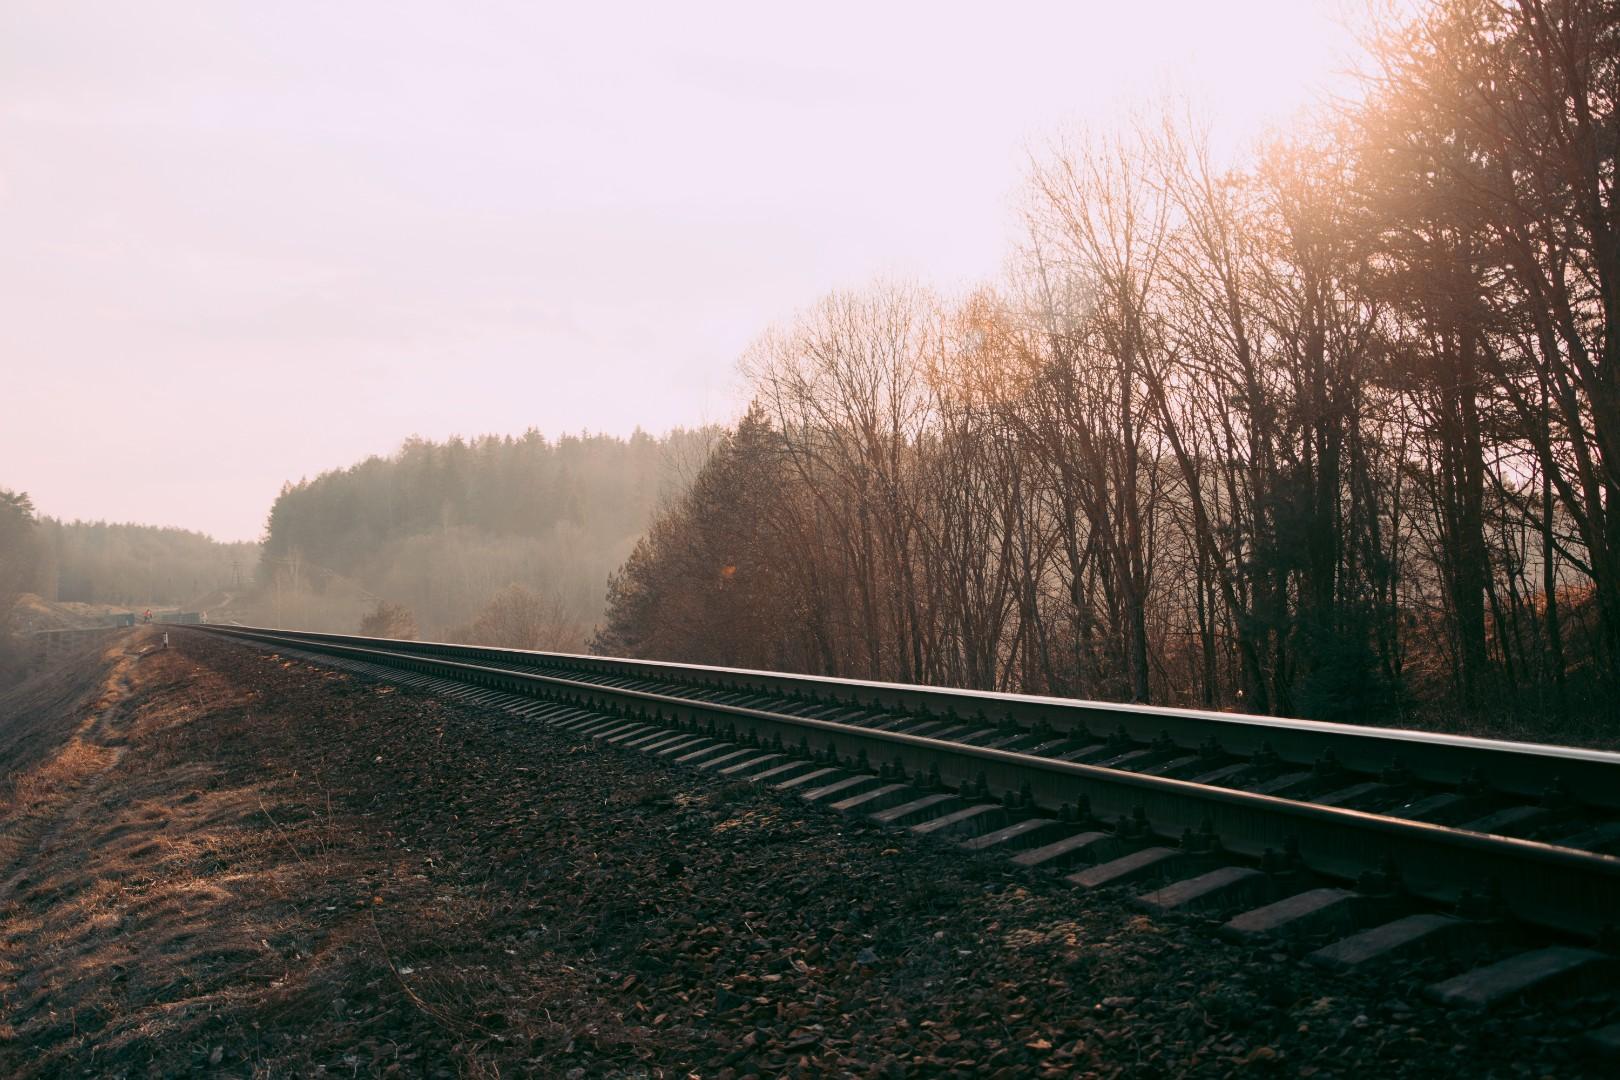 train-rails-photography-673803.jpg